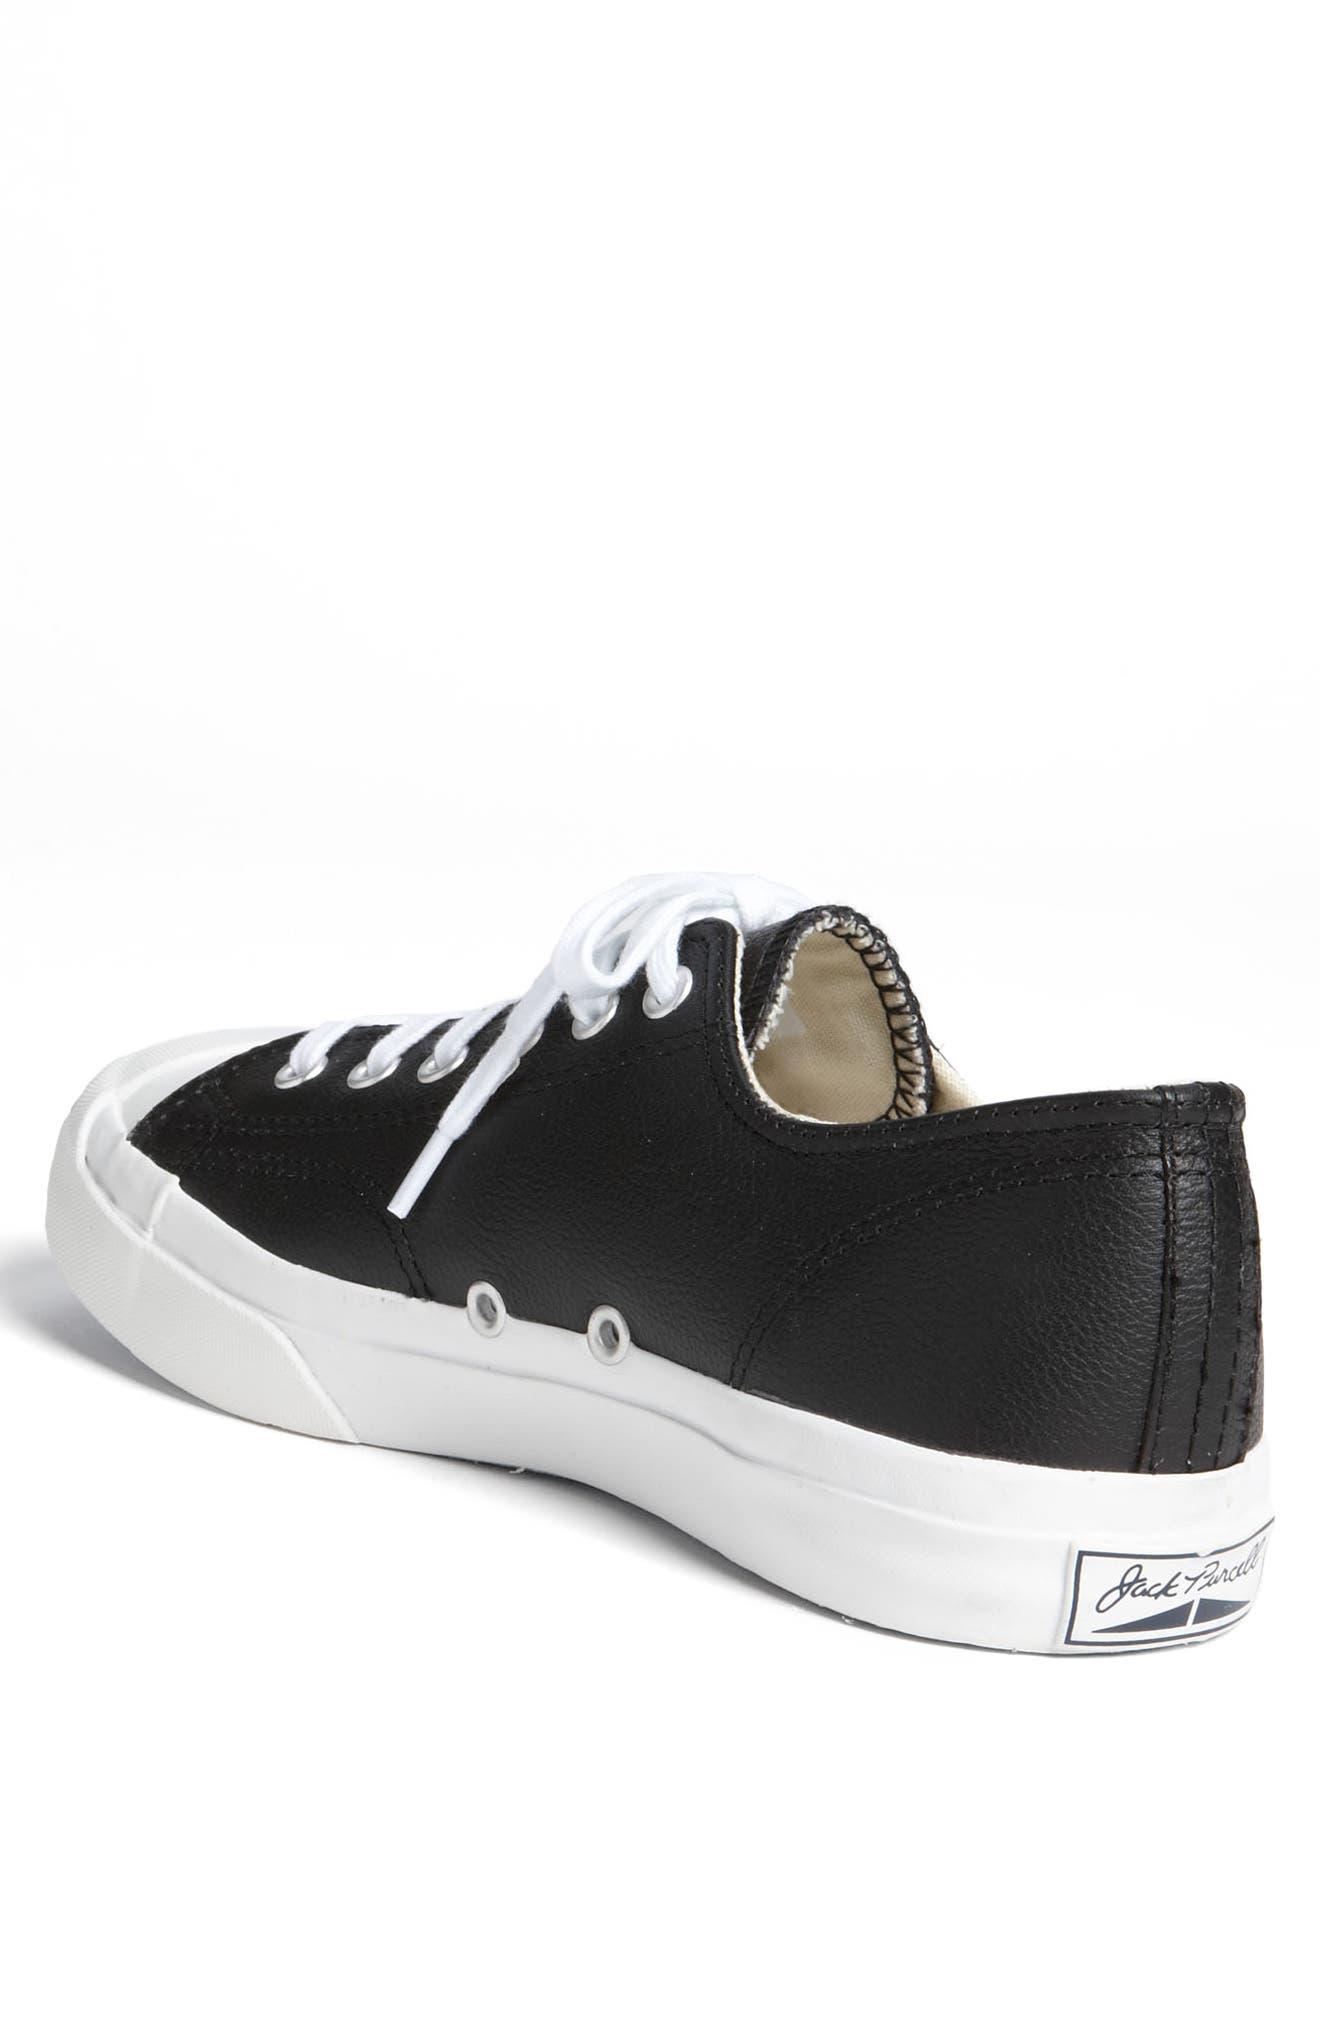 'Jack Purcell' Leather Sneaker,                             Alternate thumbnail 2, color,                             BLACK/ WHITE